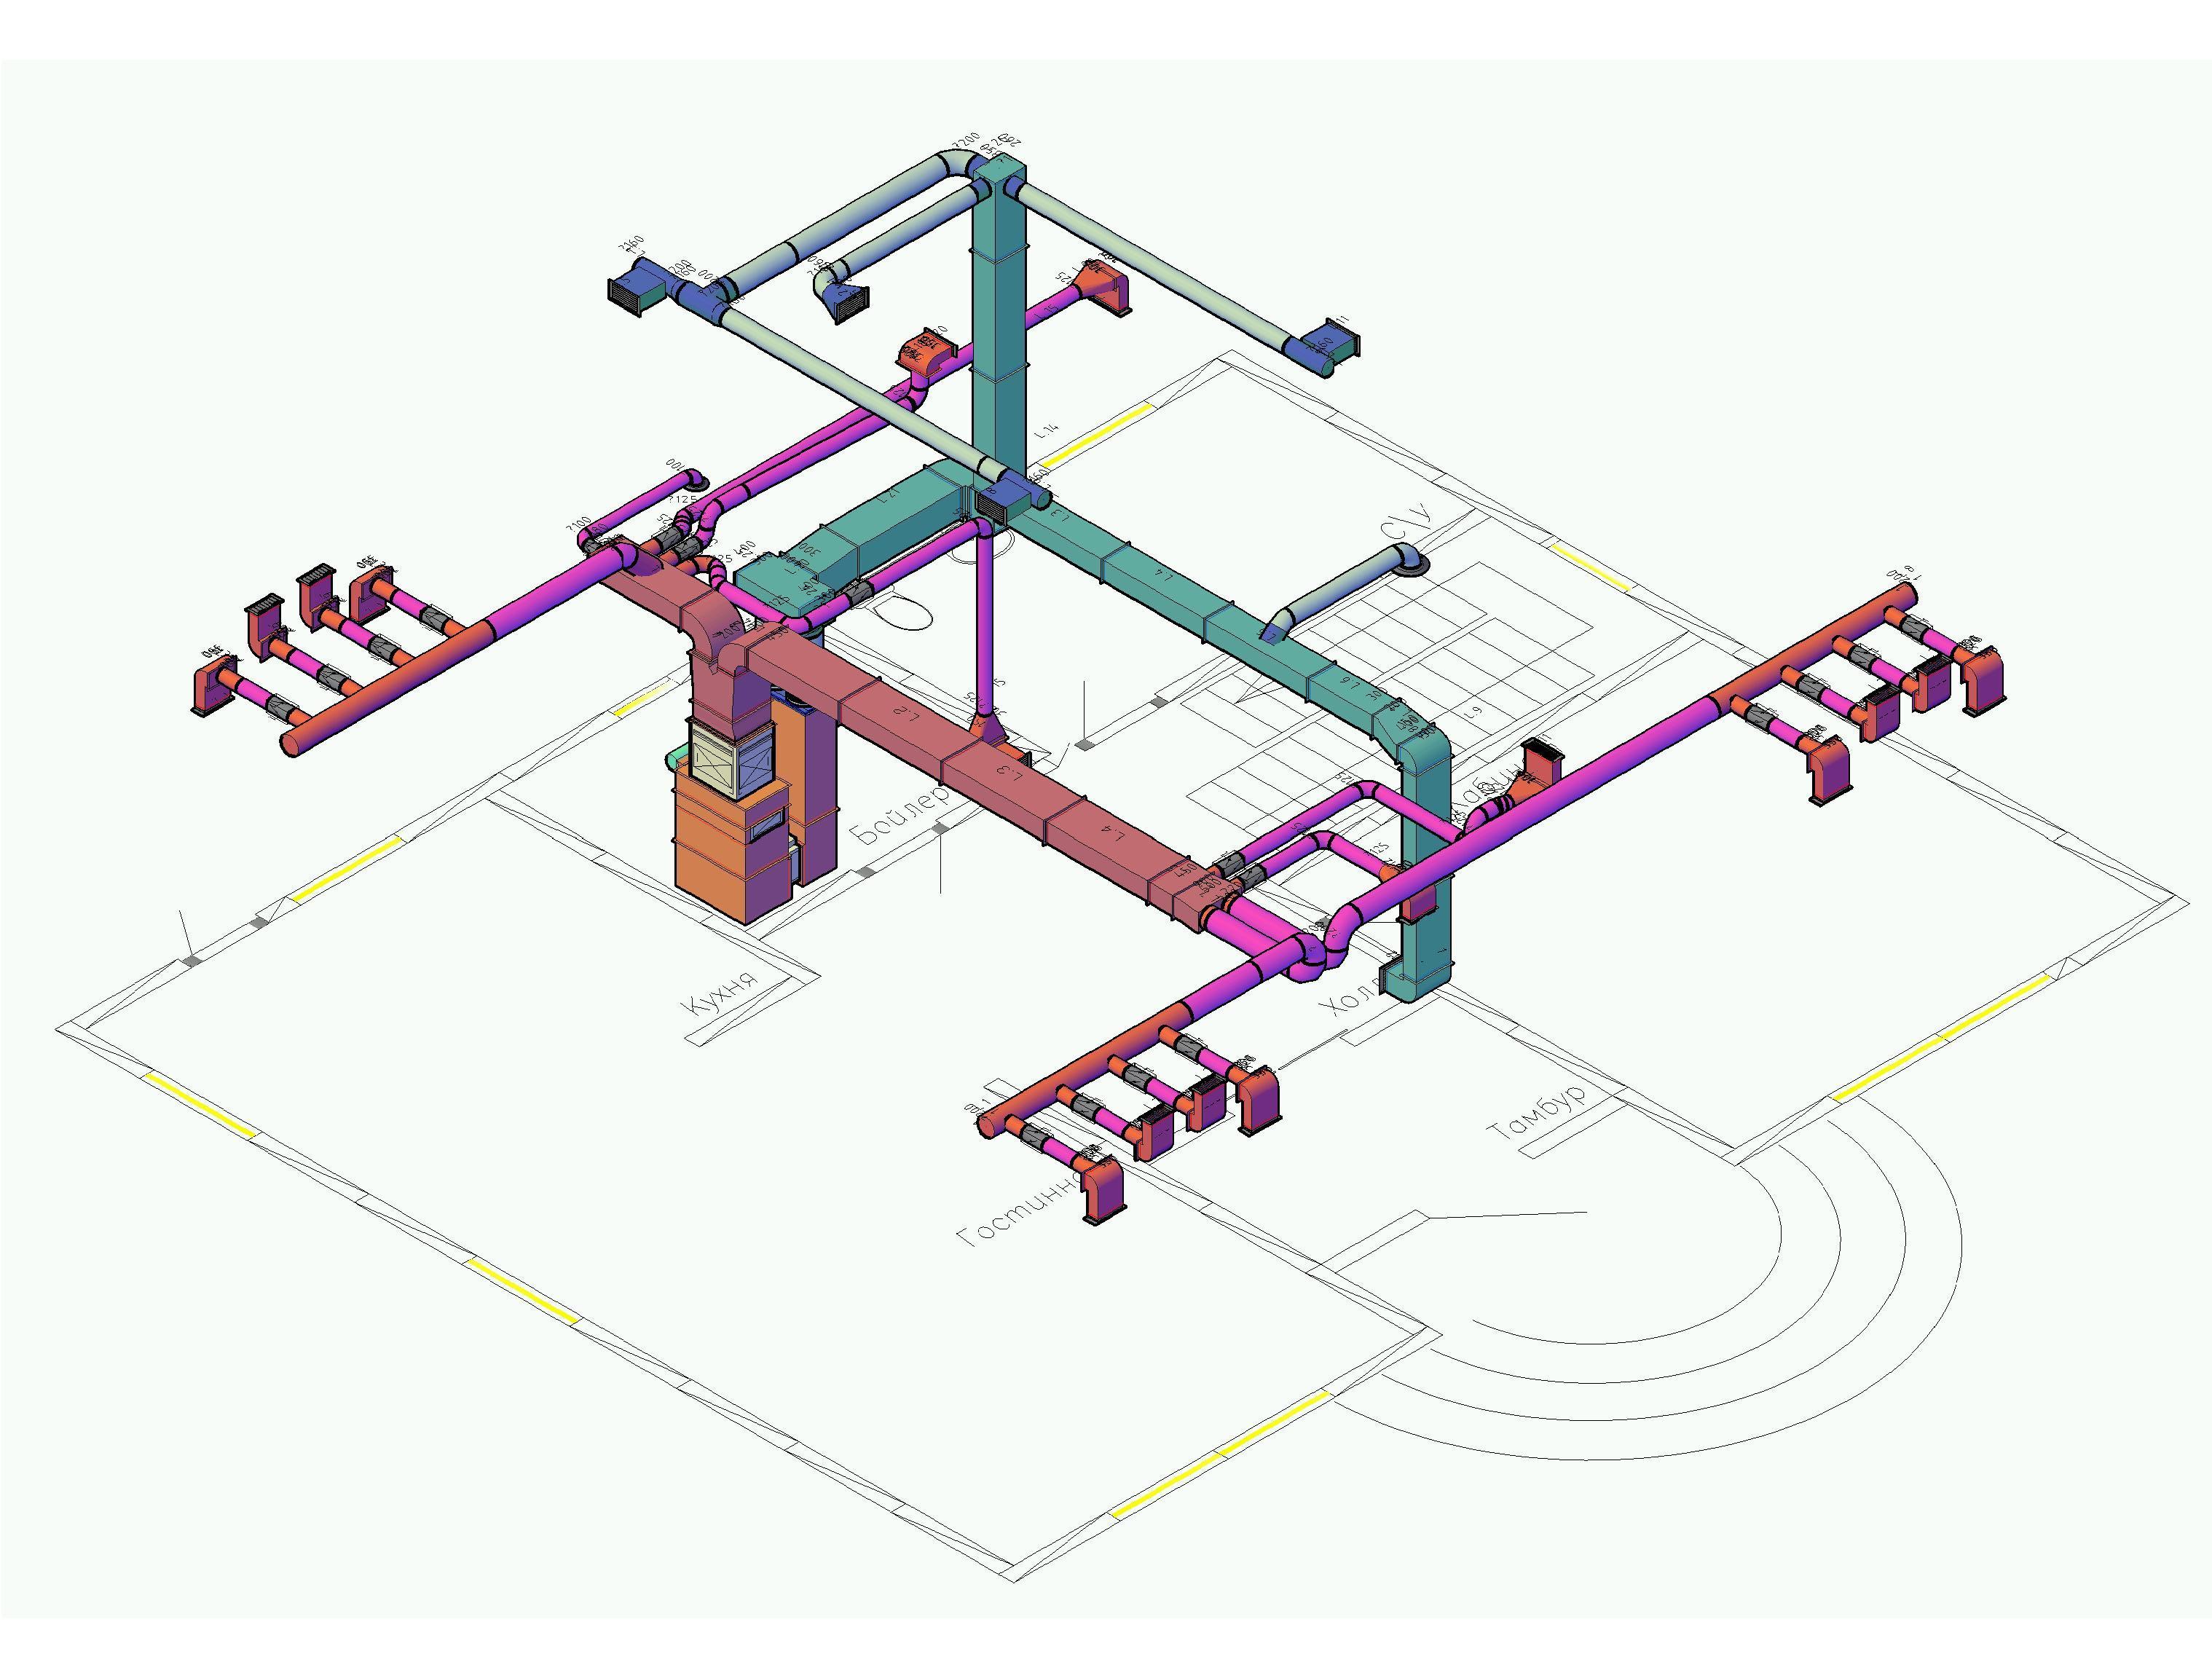 схема монтажа воздушное отопление